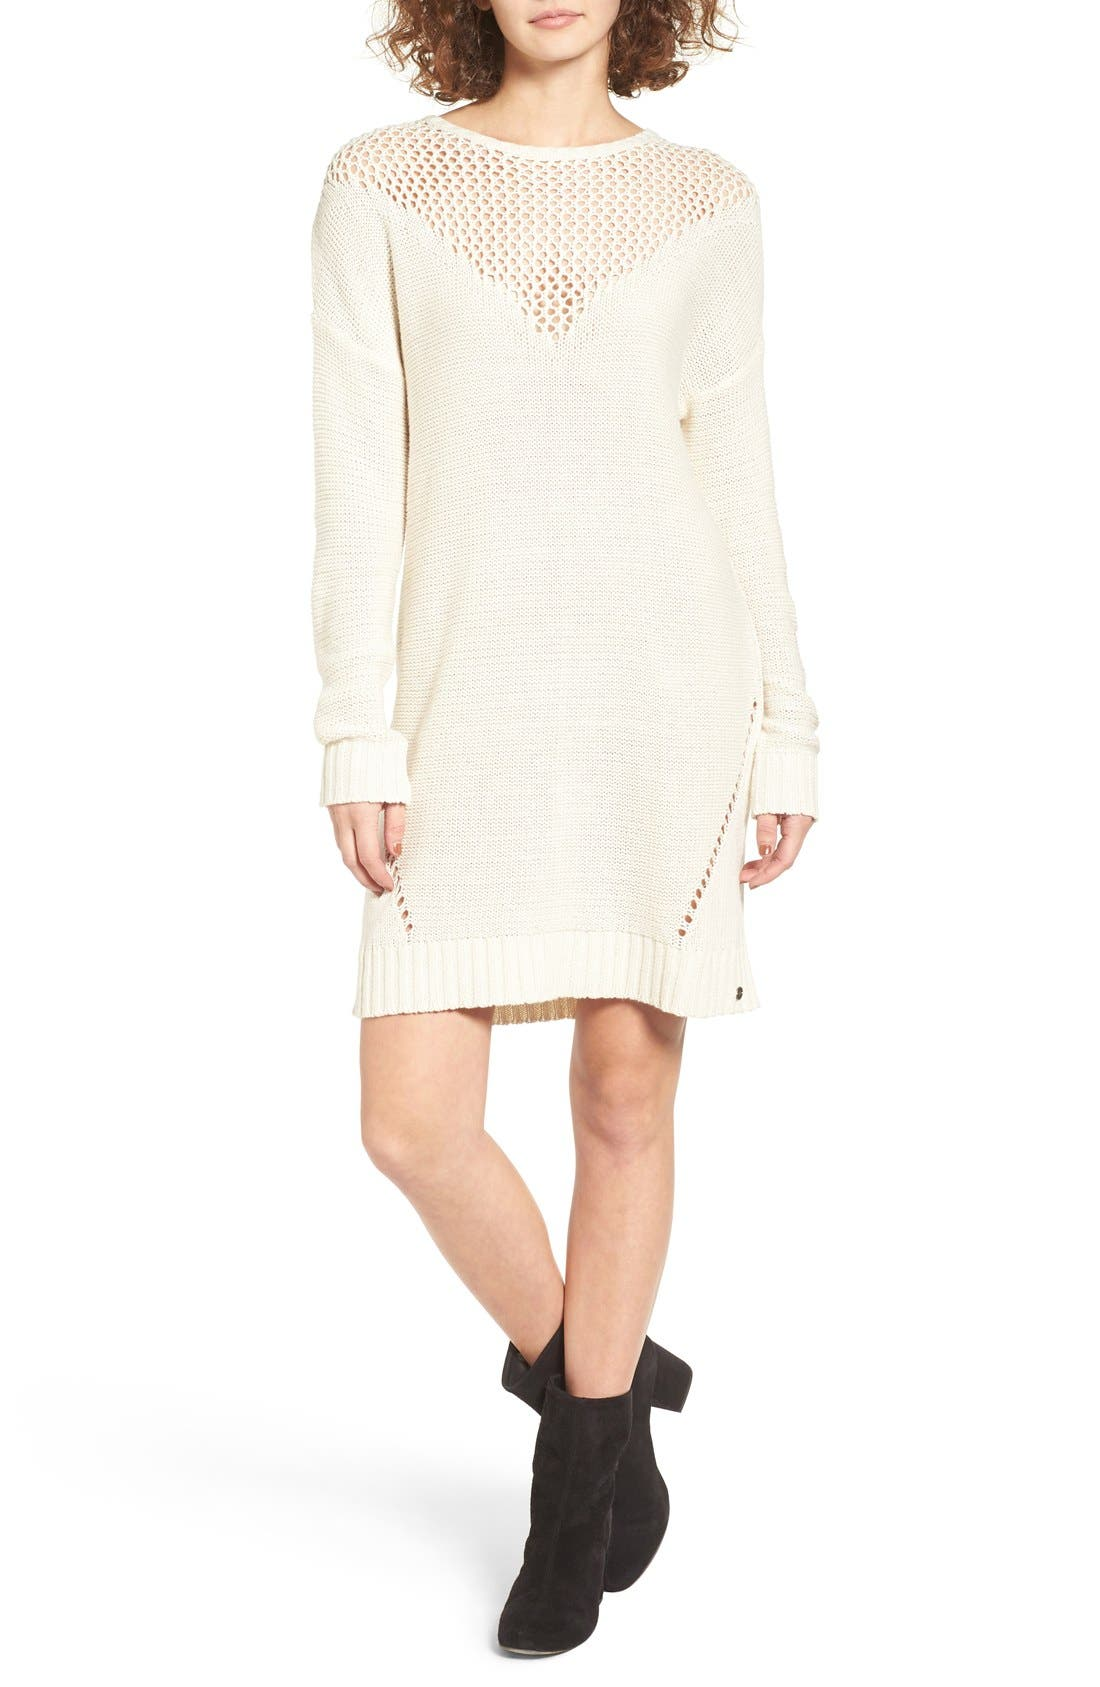 Alternate Image 1 Selected - Roxy Borrowed Time Open Knit Sweater Dress